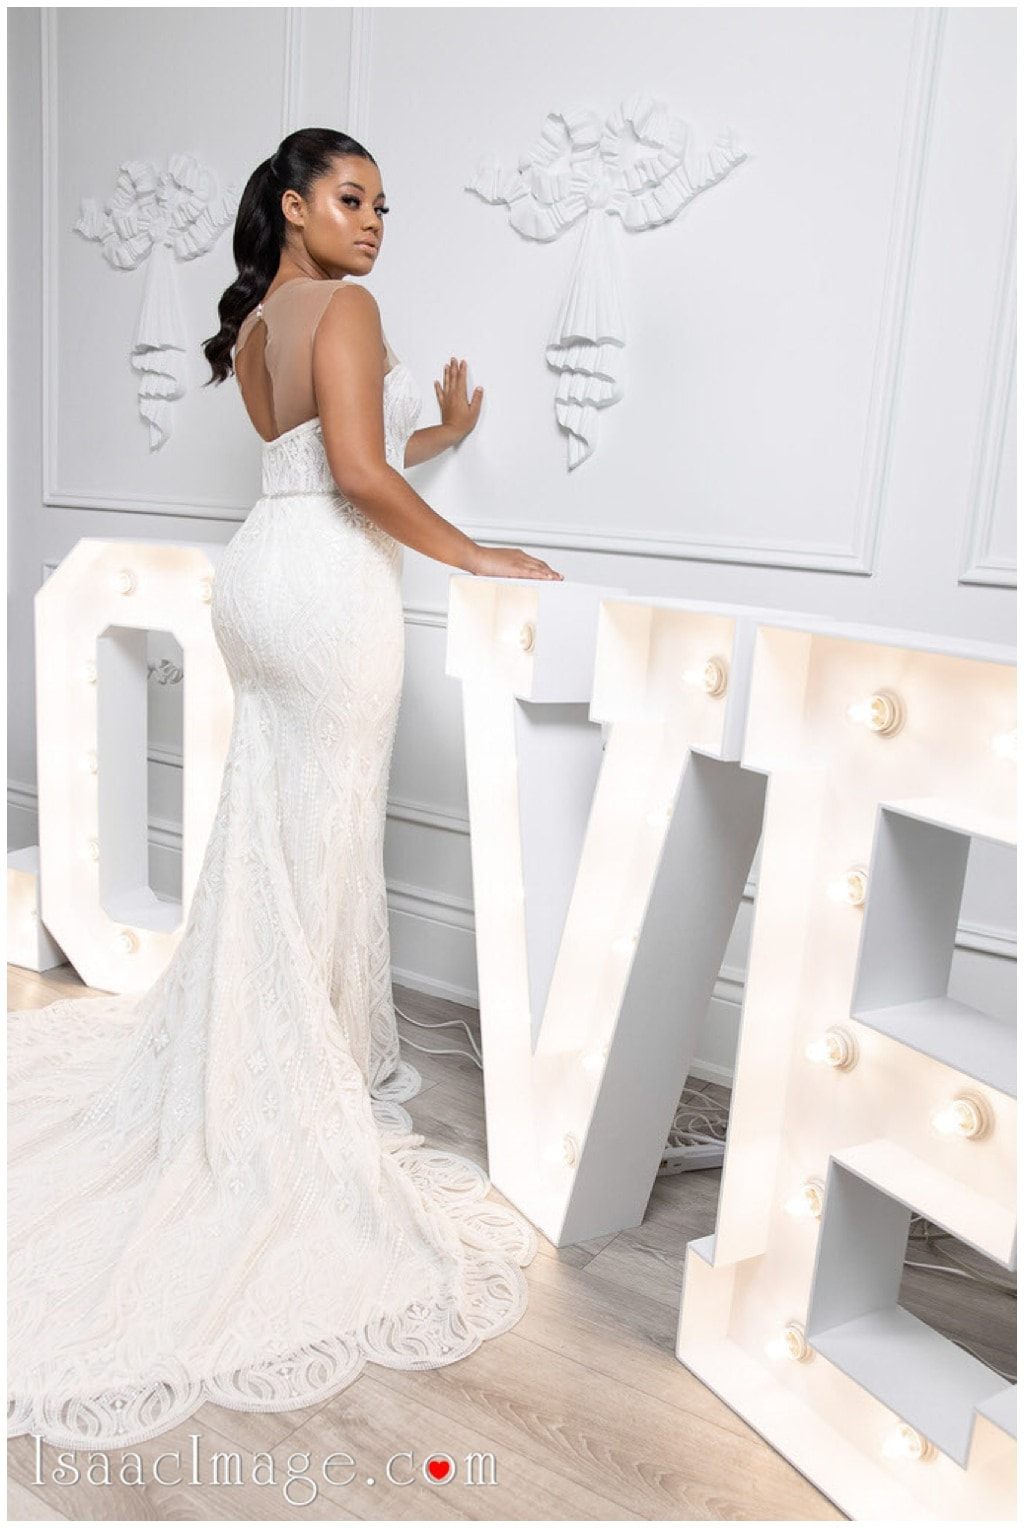 Toronto top bridal show_6755.jpg